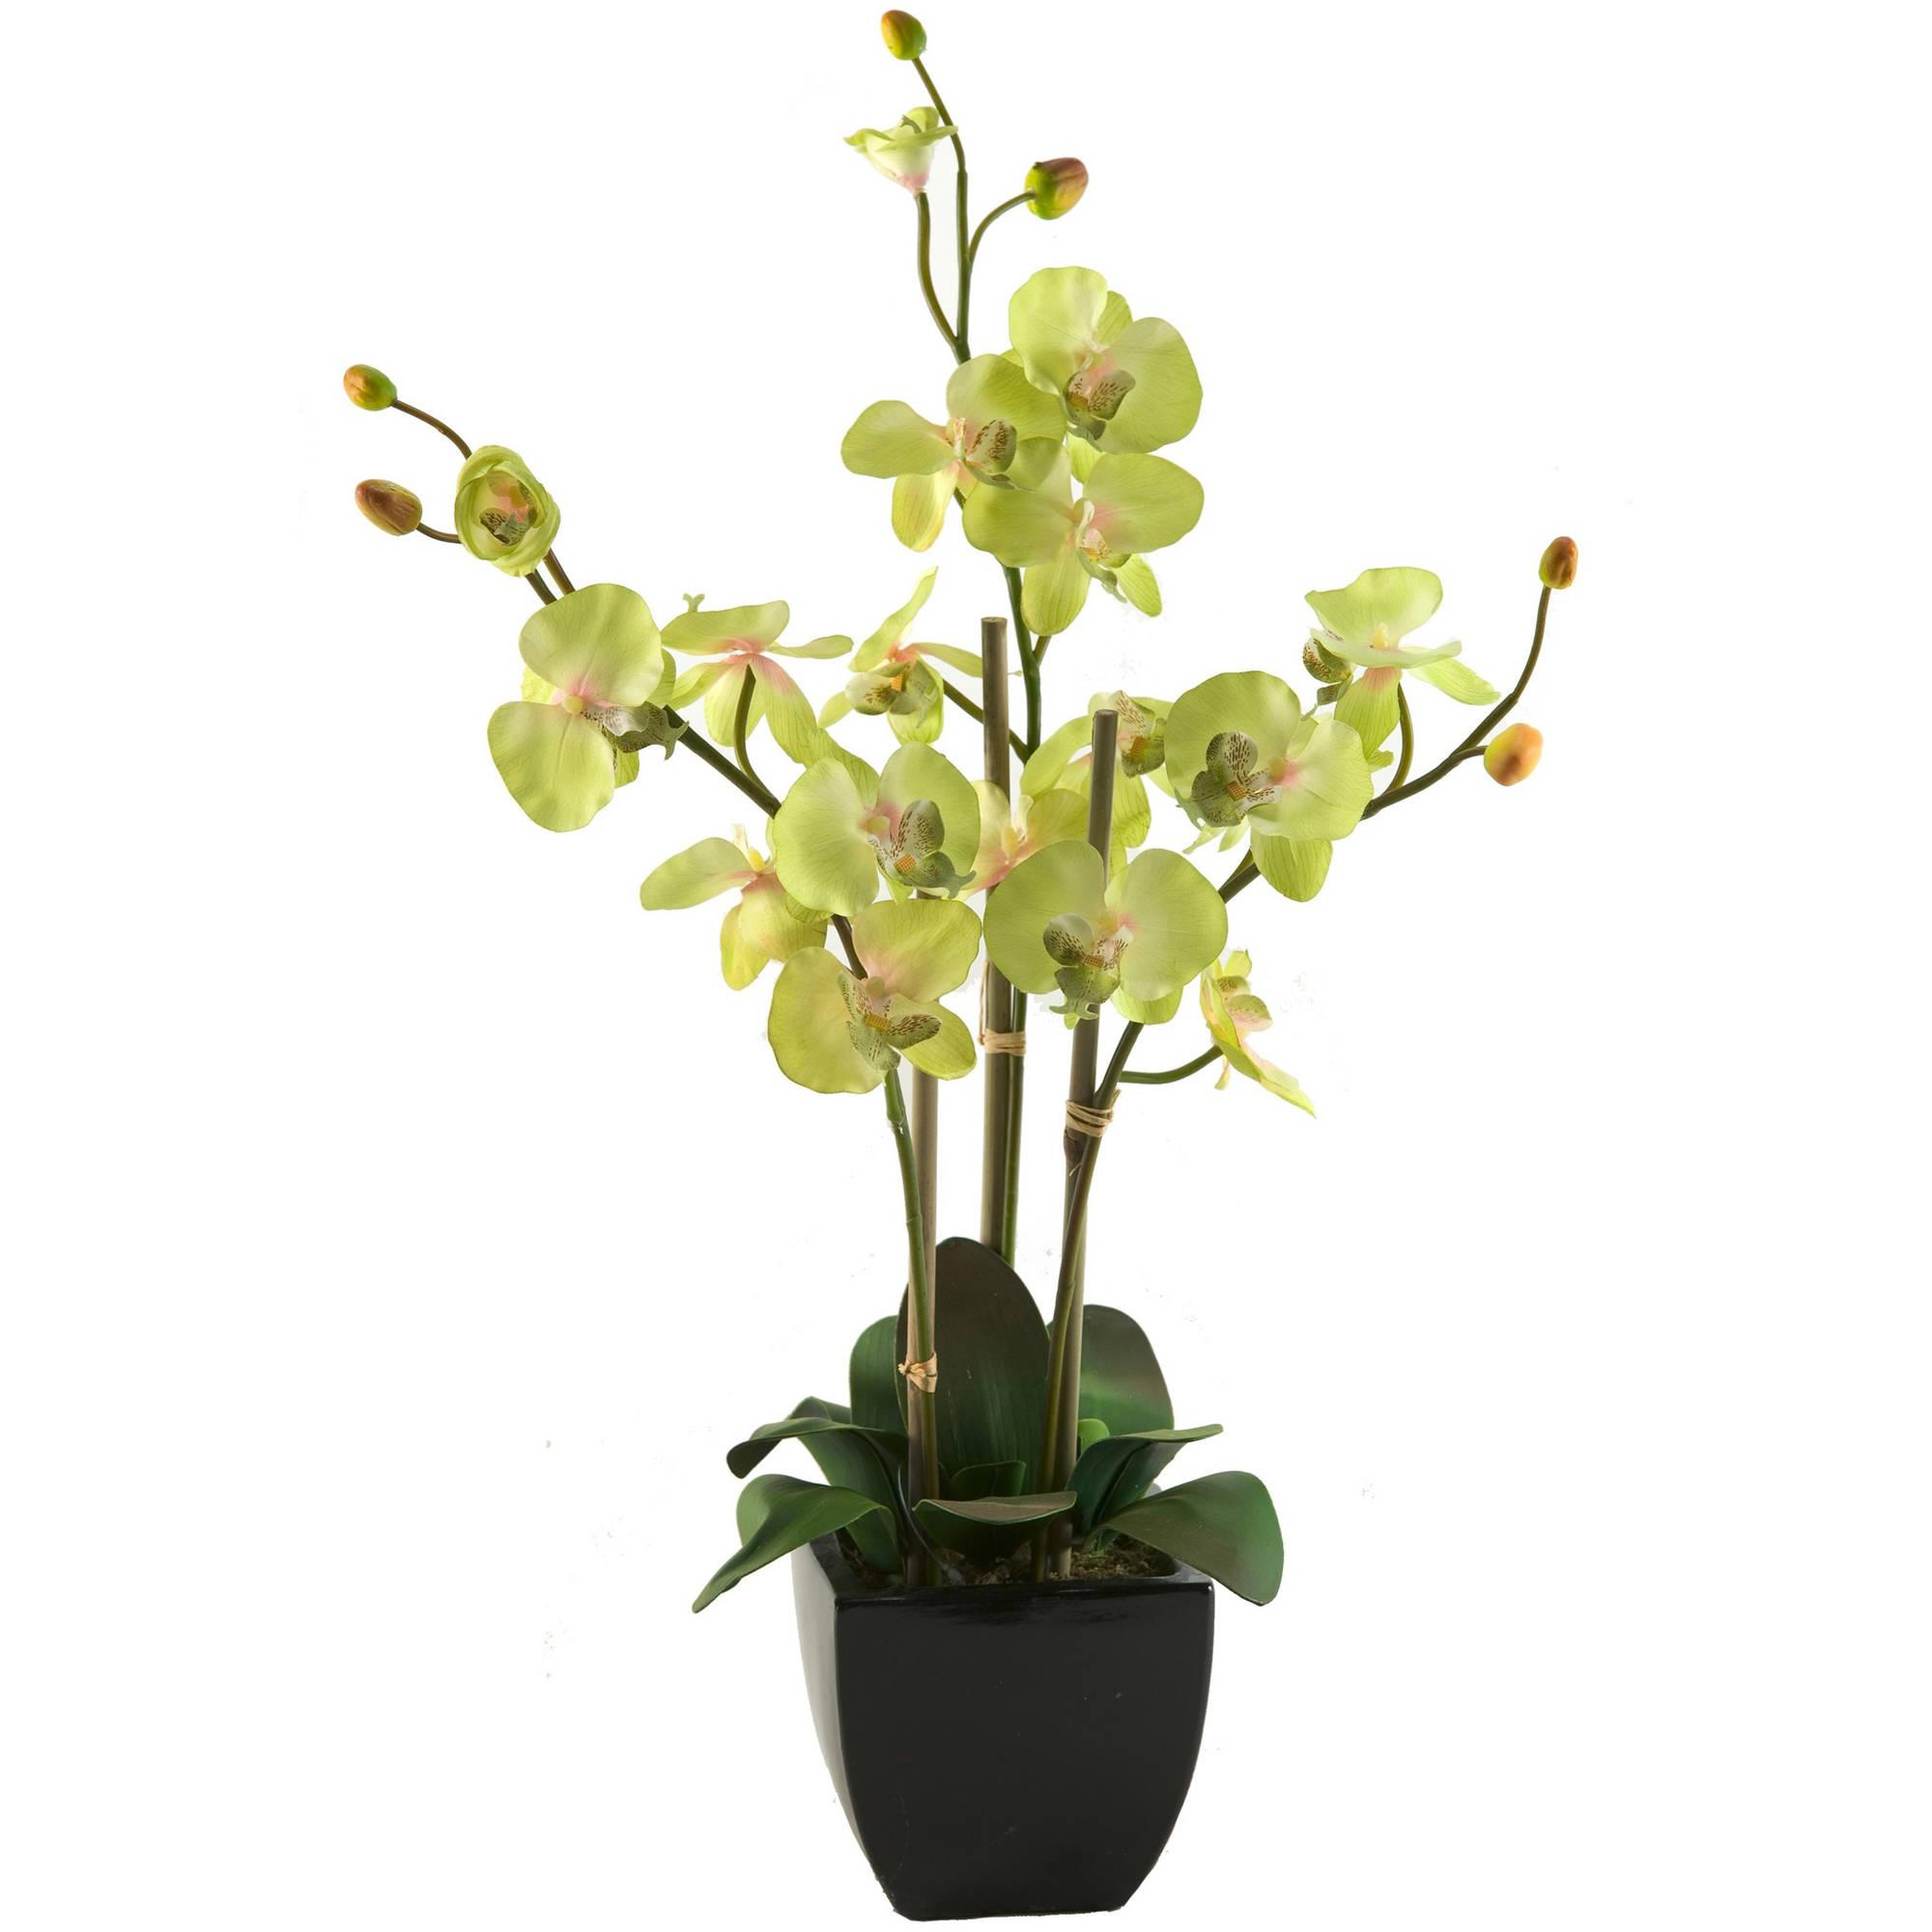 D&W Silks Green Phael Orchids in Black Ceramic Planter